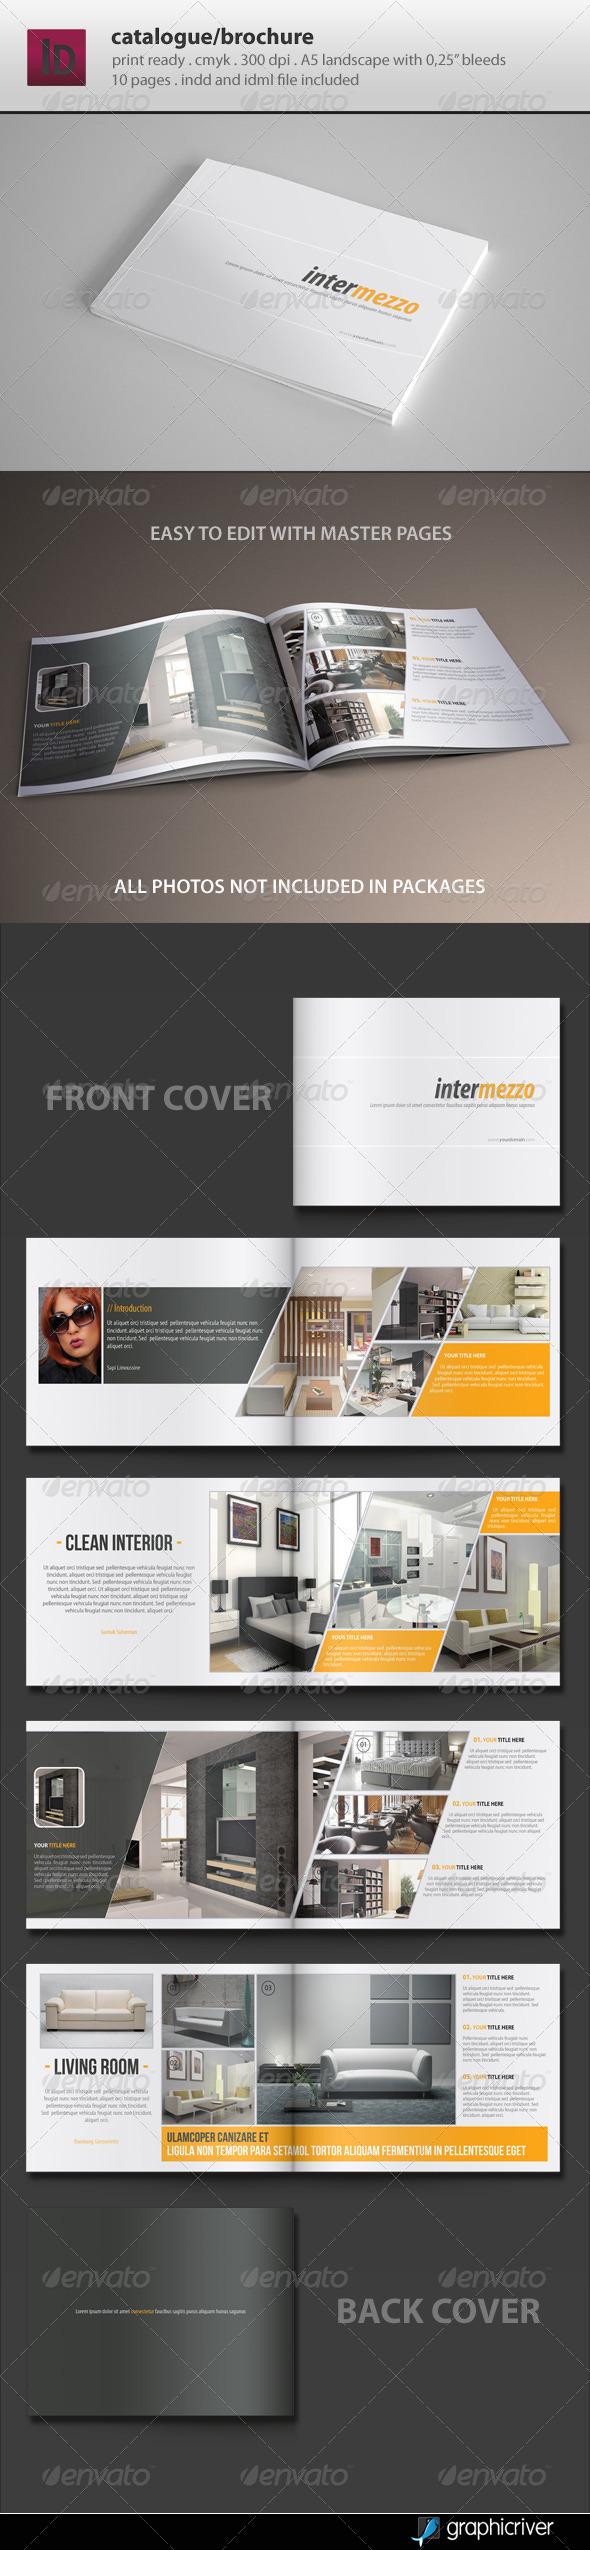 GraphicRiver Catalogue Brochure Template 4763514